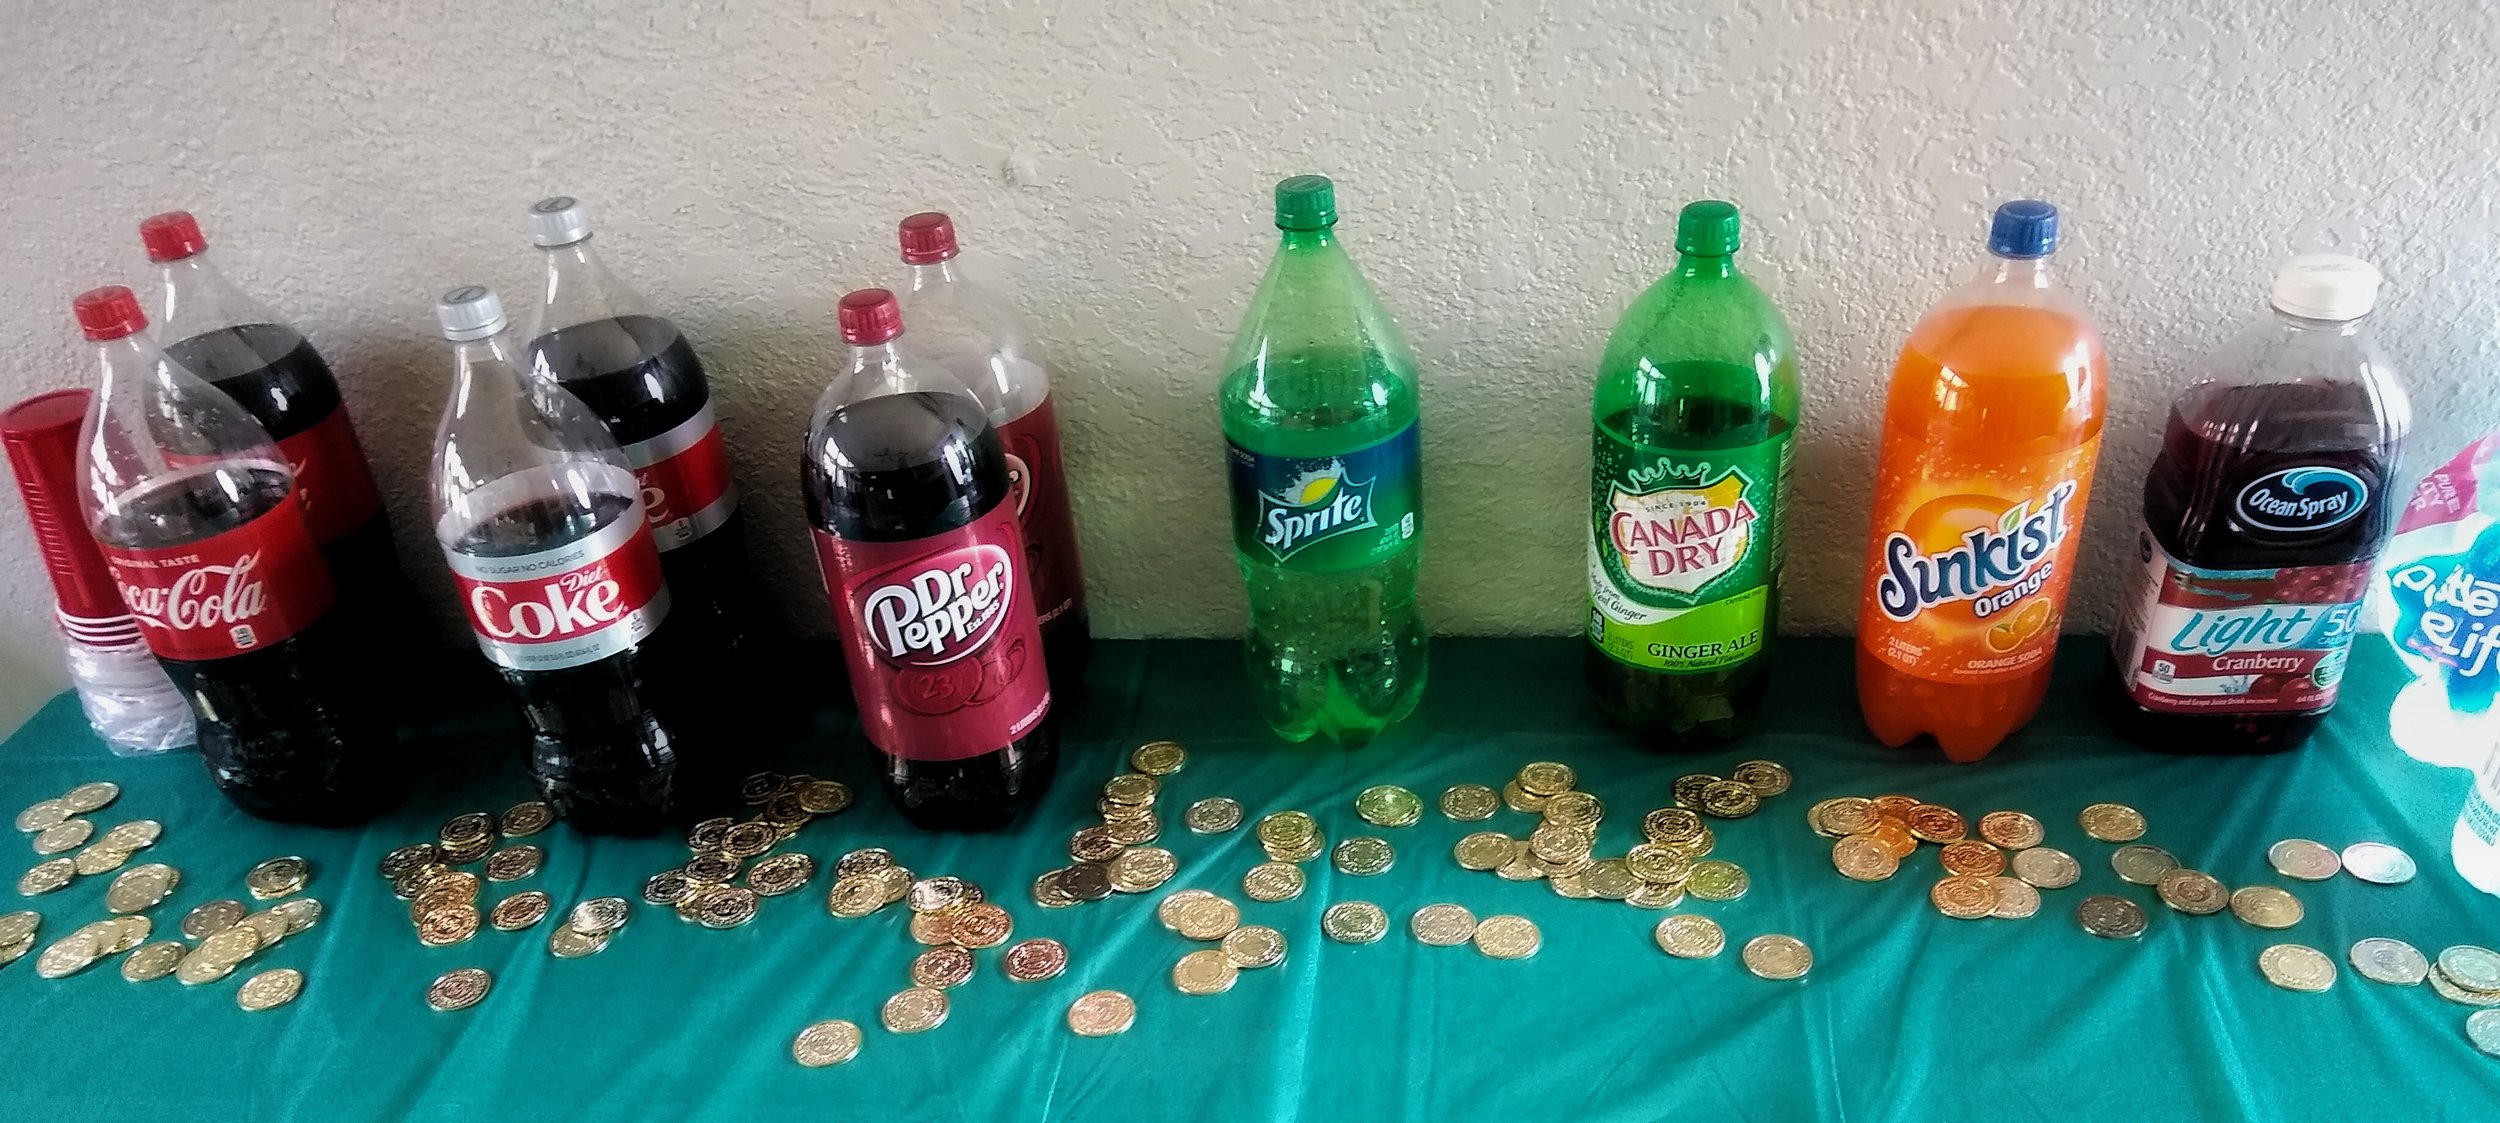 drink-hobbit-party.jpeg